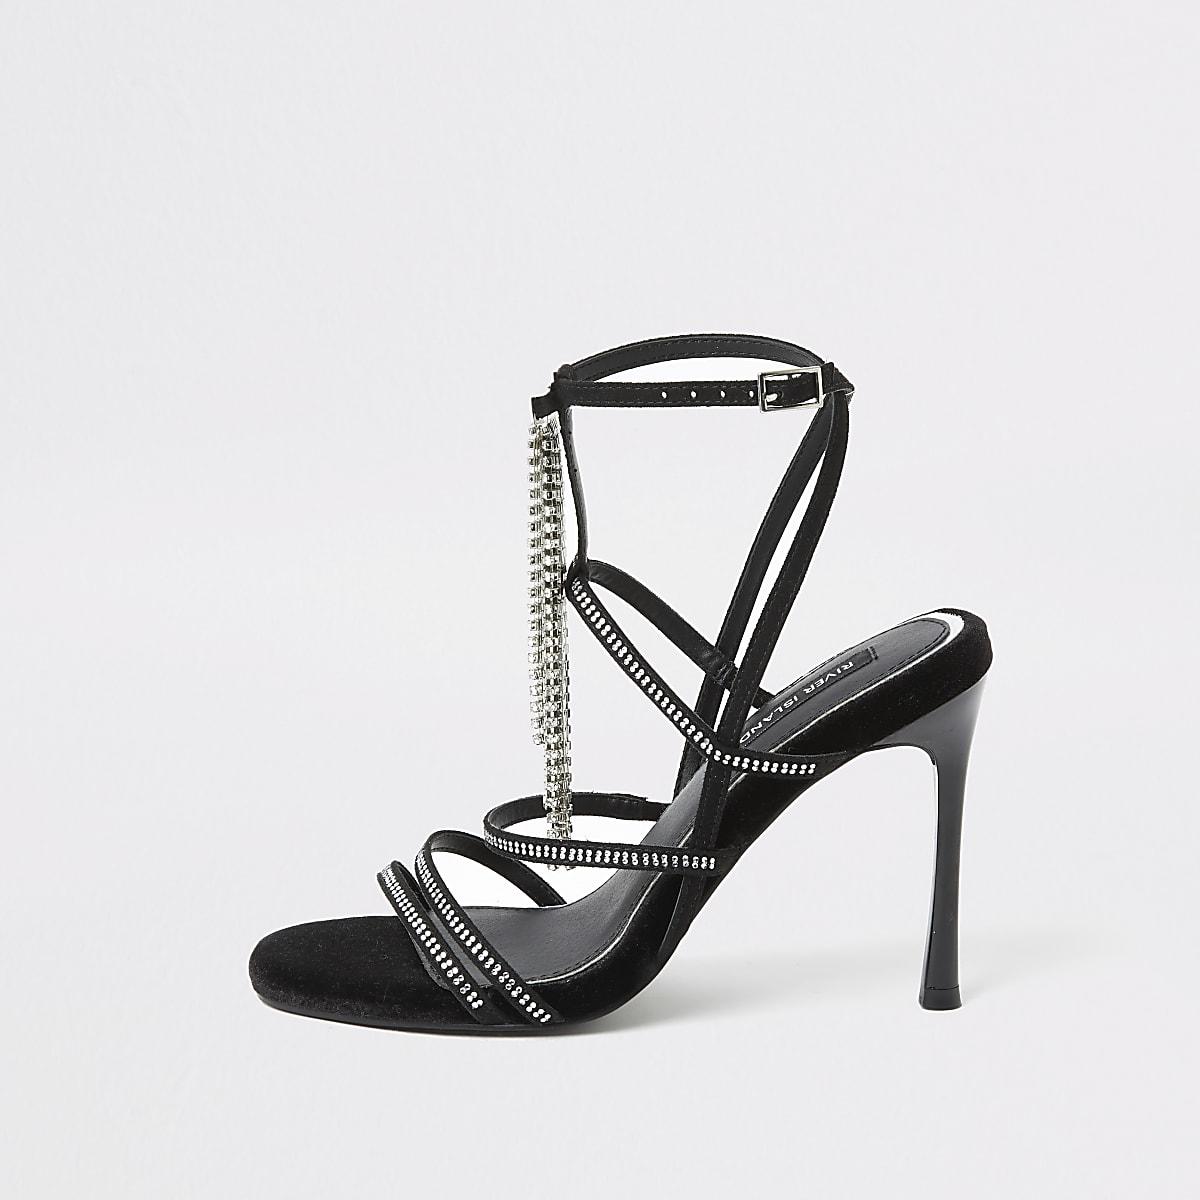 Black diamante strappy heeled sandal